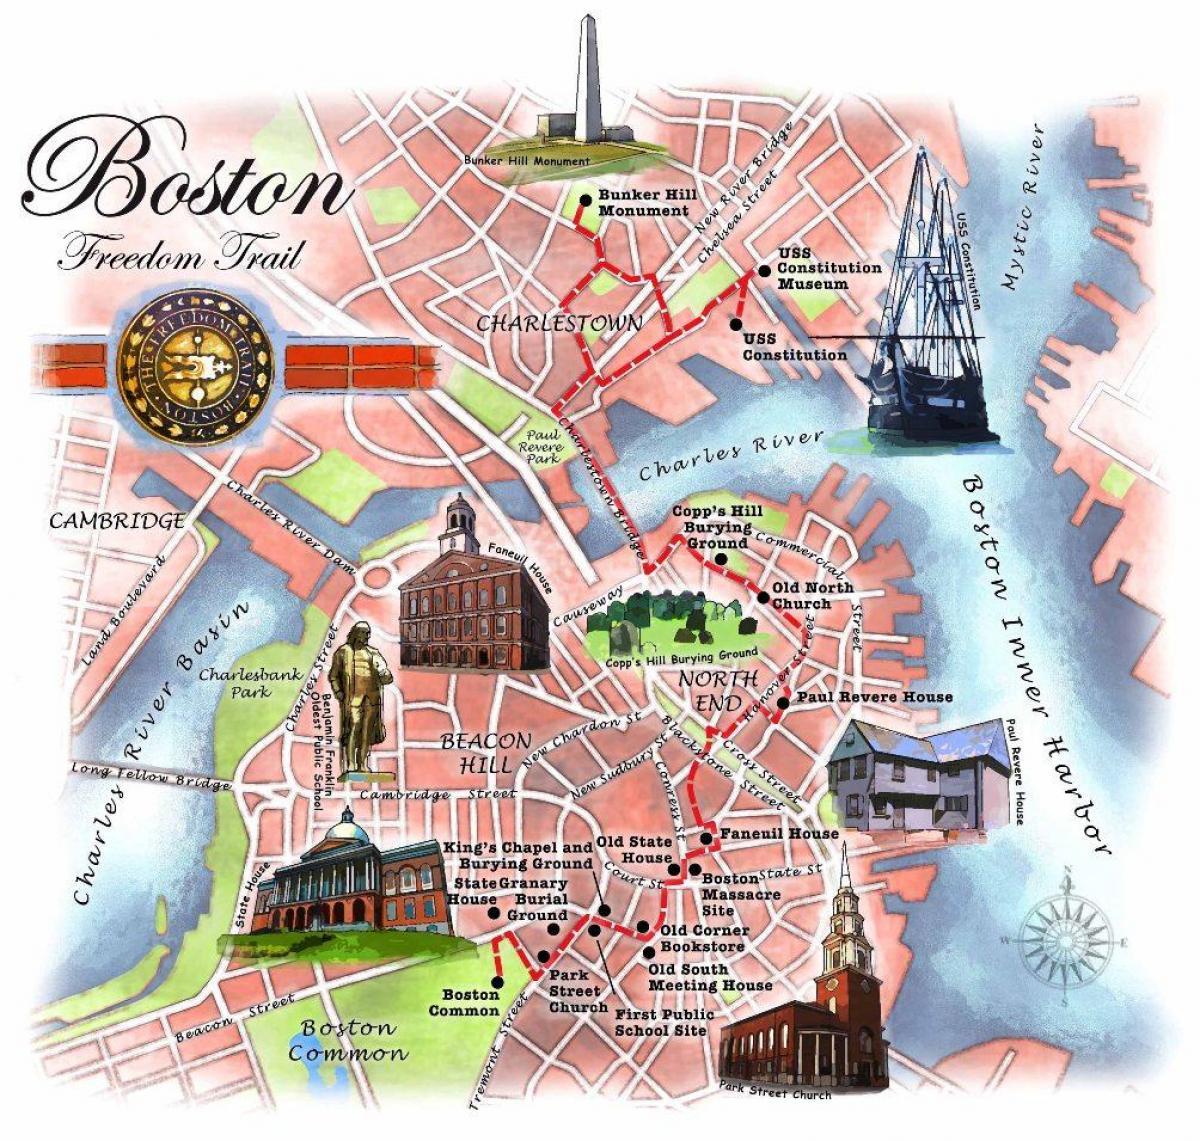 Freedom trail Boston map   Map of Boston freedom trail (United